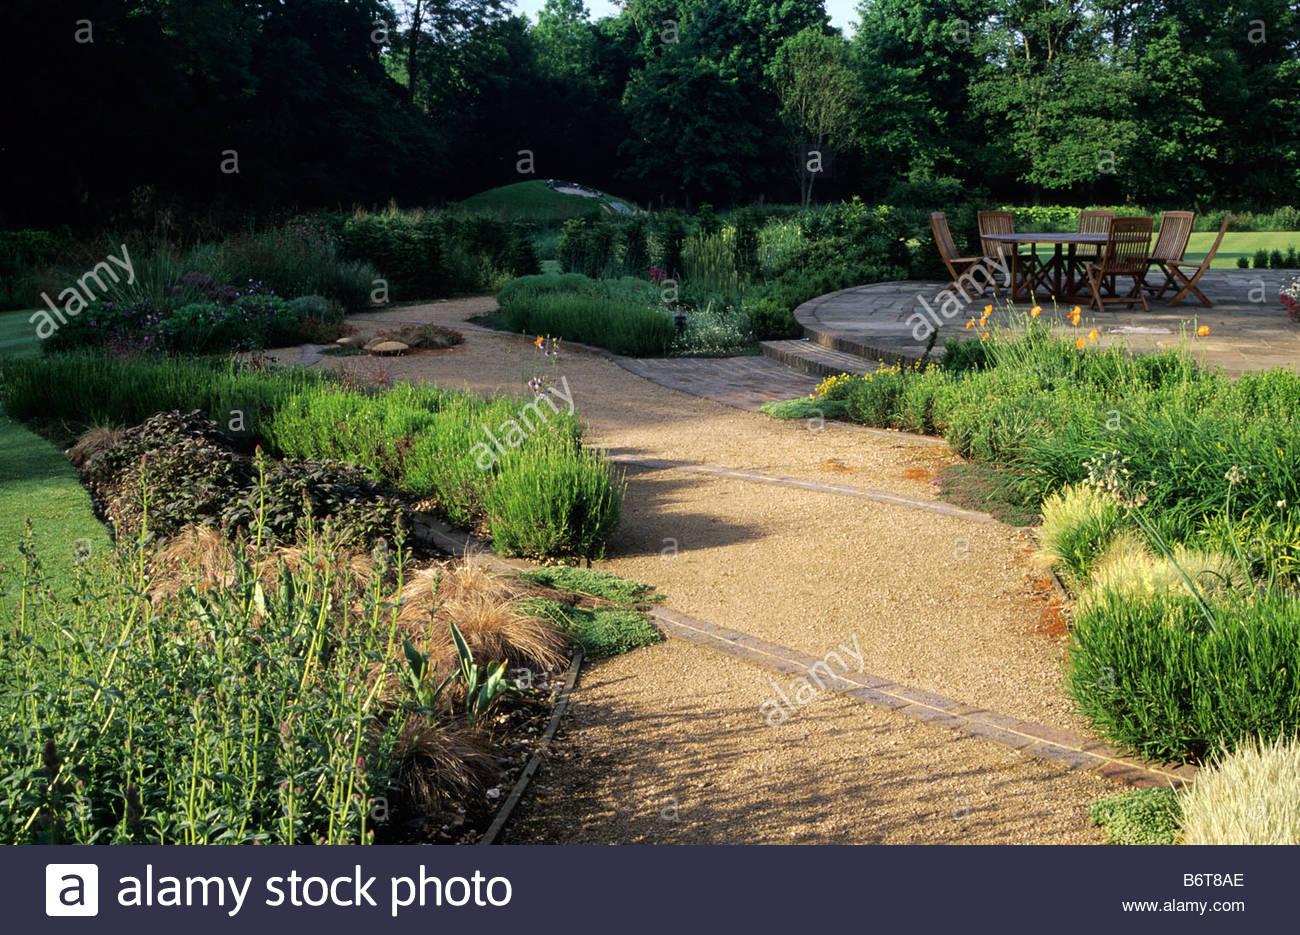 Private garten hampshire design barbara hunt moderner gartengestaltung kies weg terrasse - Gartengestaltung kies ...